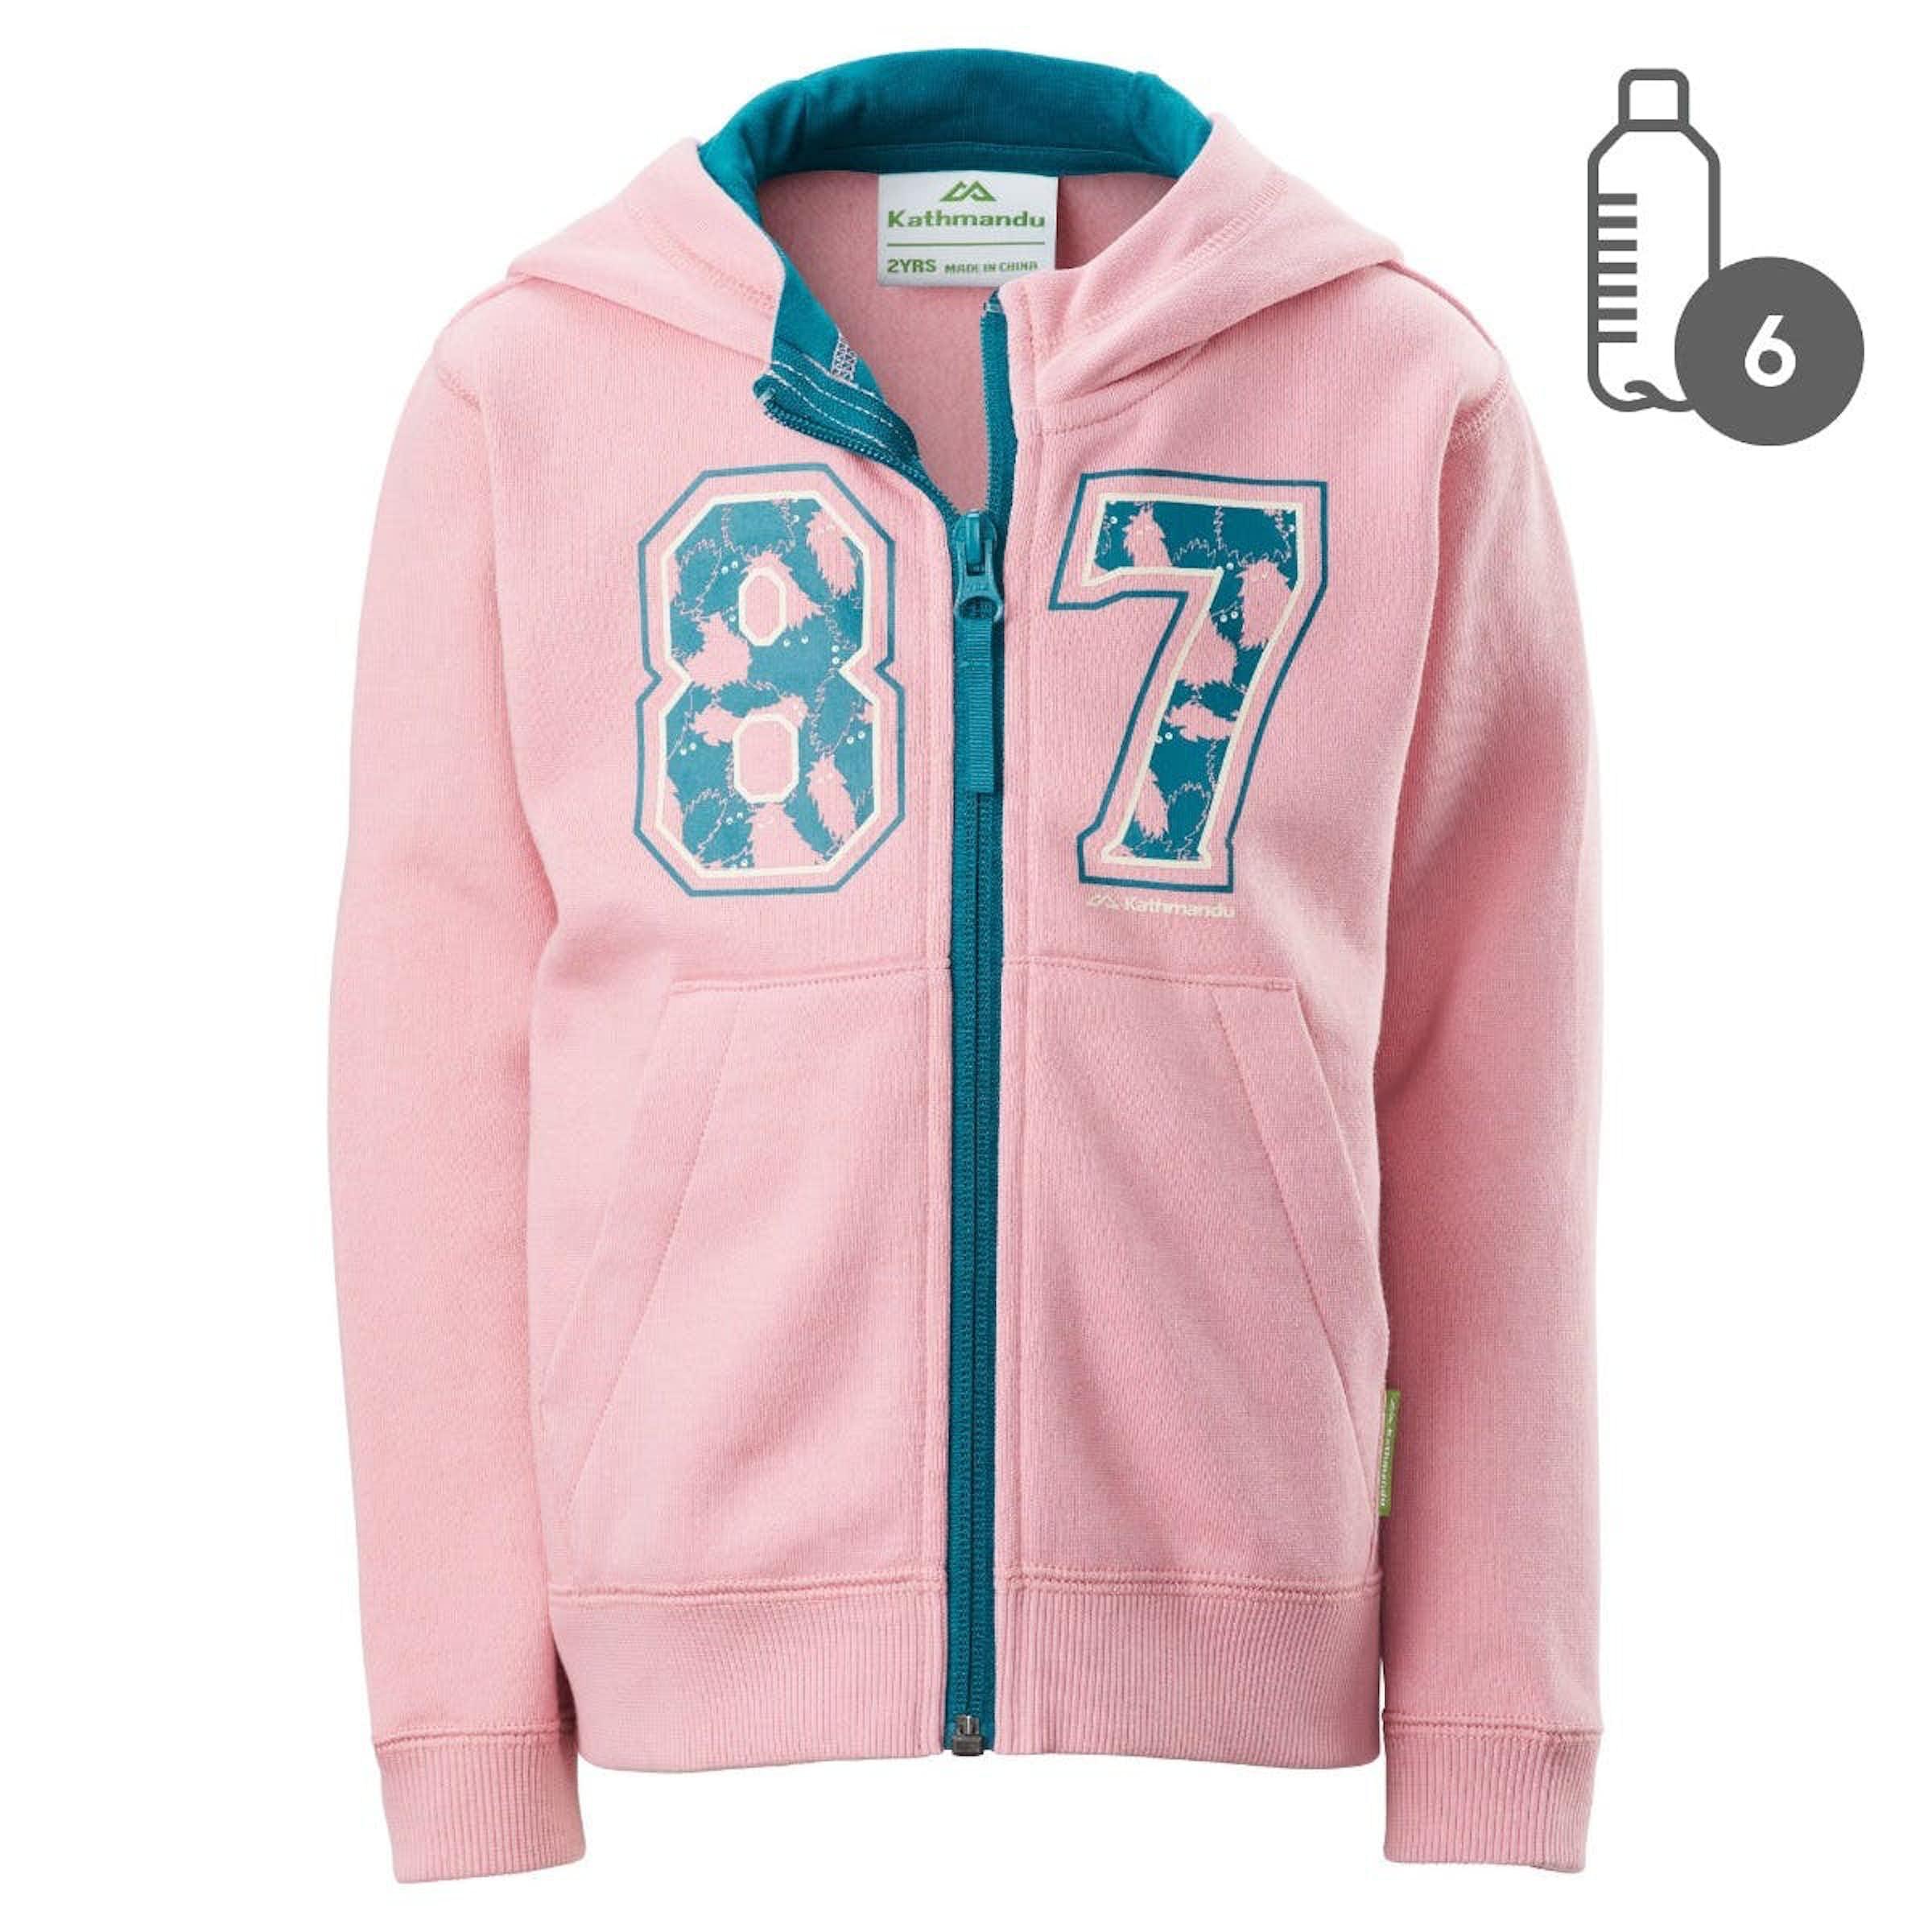 790da3eb2c509 Clearance of Kids' Outdoor Clothing & Gear | Kathmandu NZ